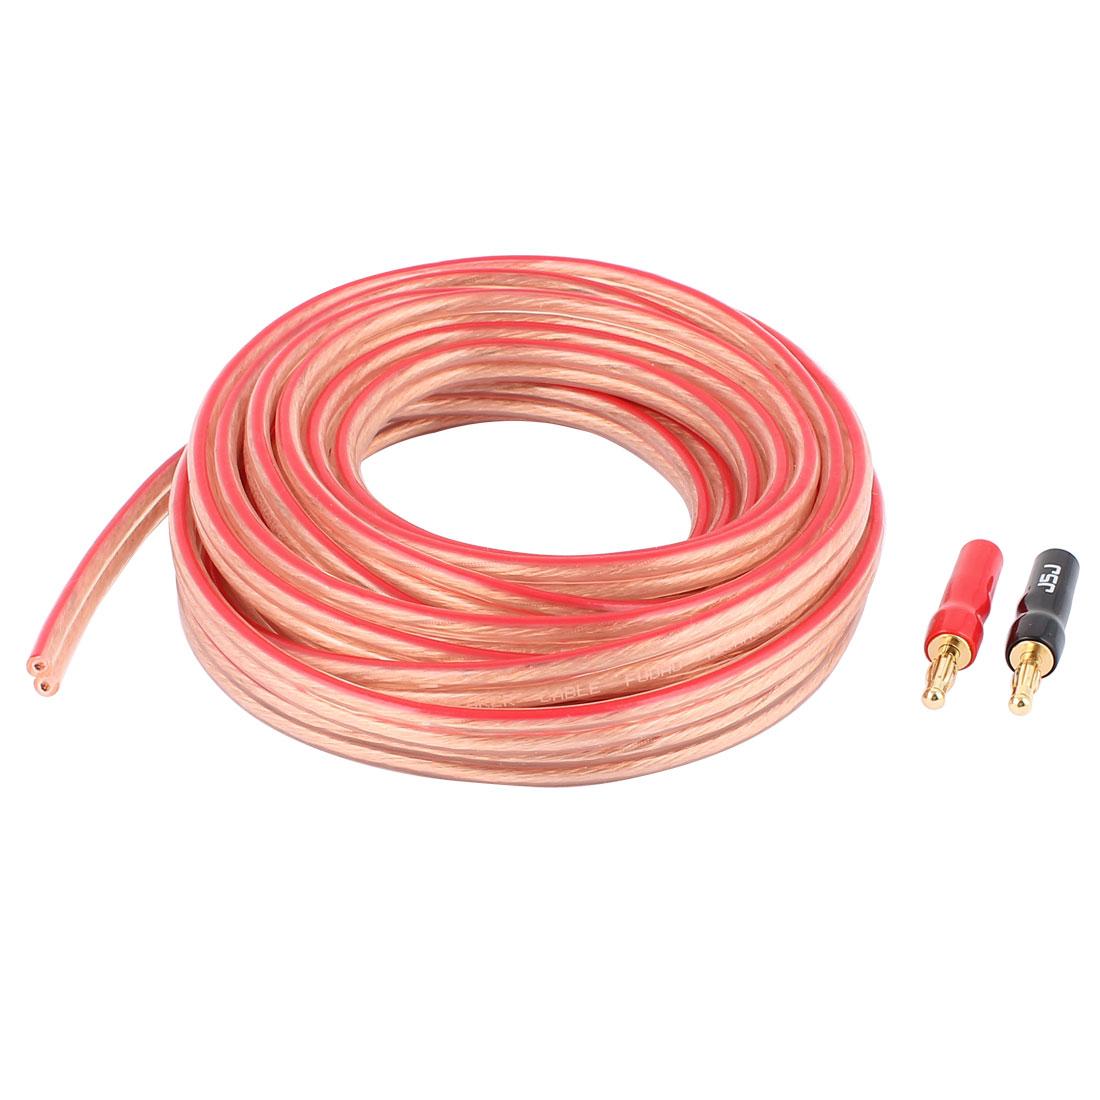 Unique Bargains 5 Meter 16 Ft Speaker 400 Fine Copper Wire Core Cable w 2 Connector